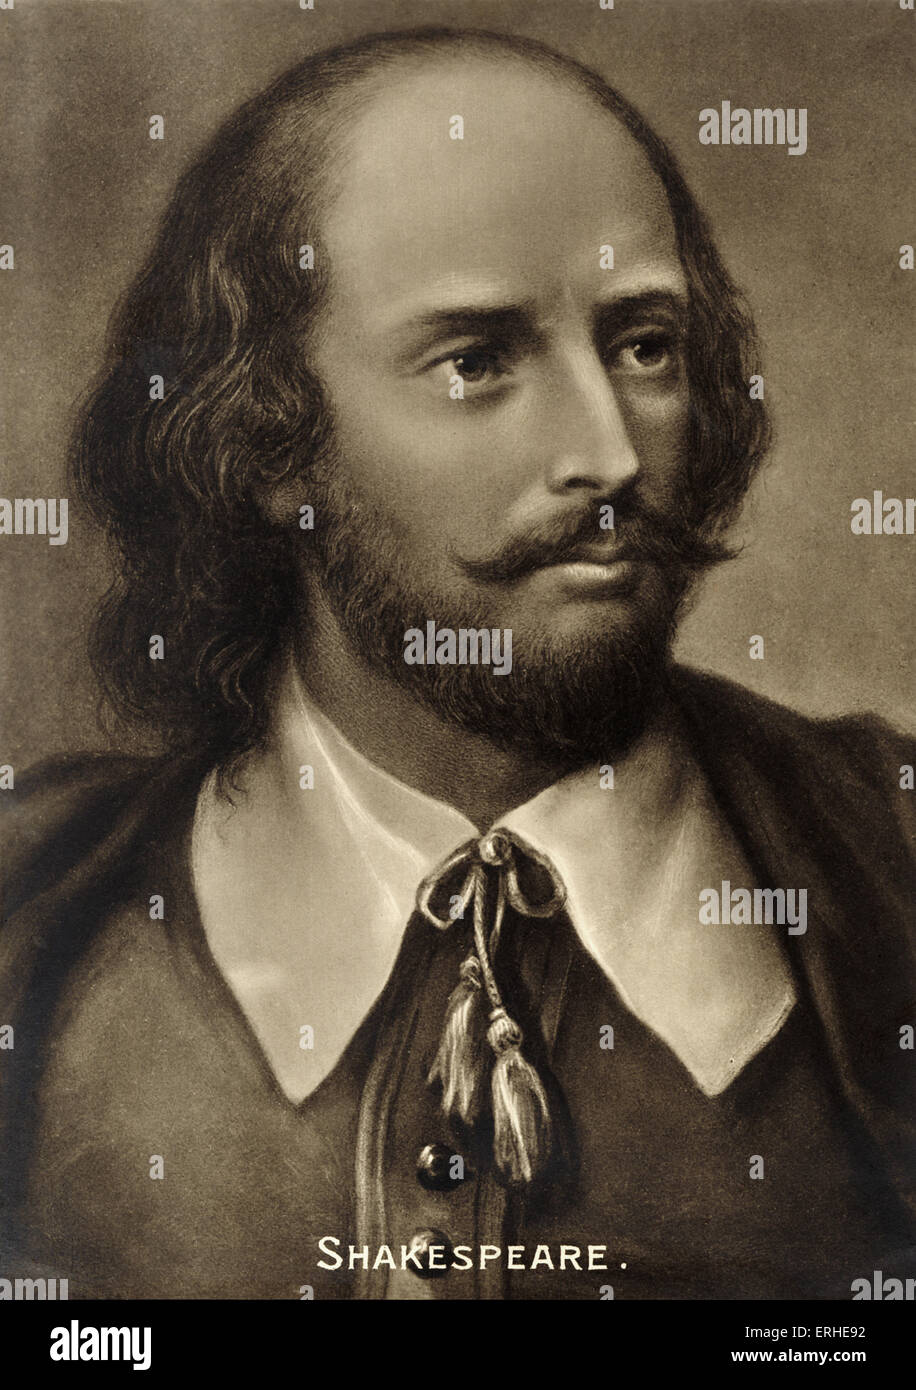 William Shakespeare, portrait. English playwright 1564-1616 Stock Photo